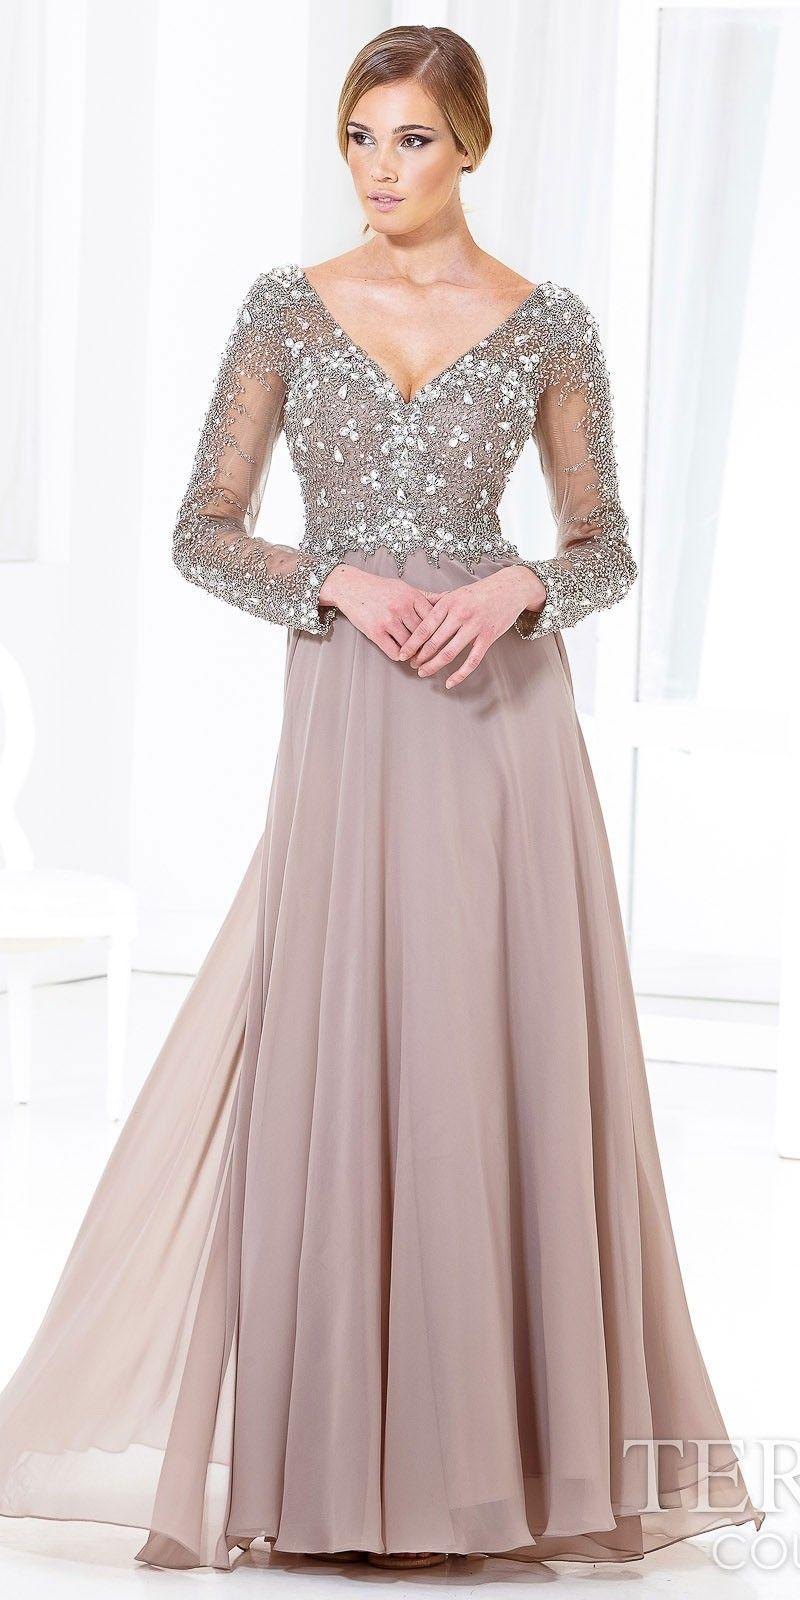 Hug Shoulder Evening Dress by Terani Couture | Fashion ideas ...